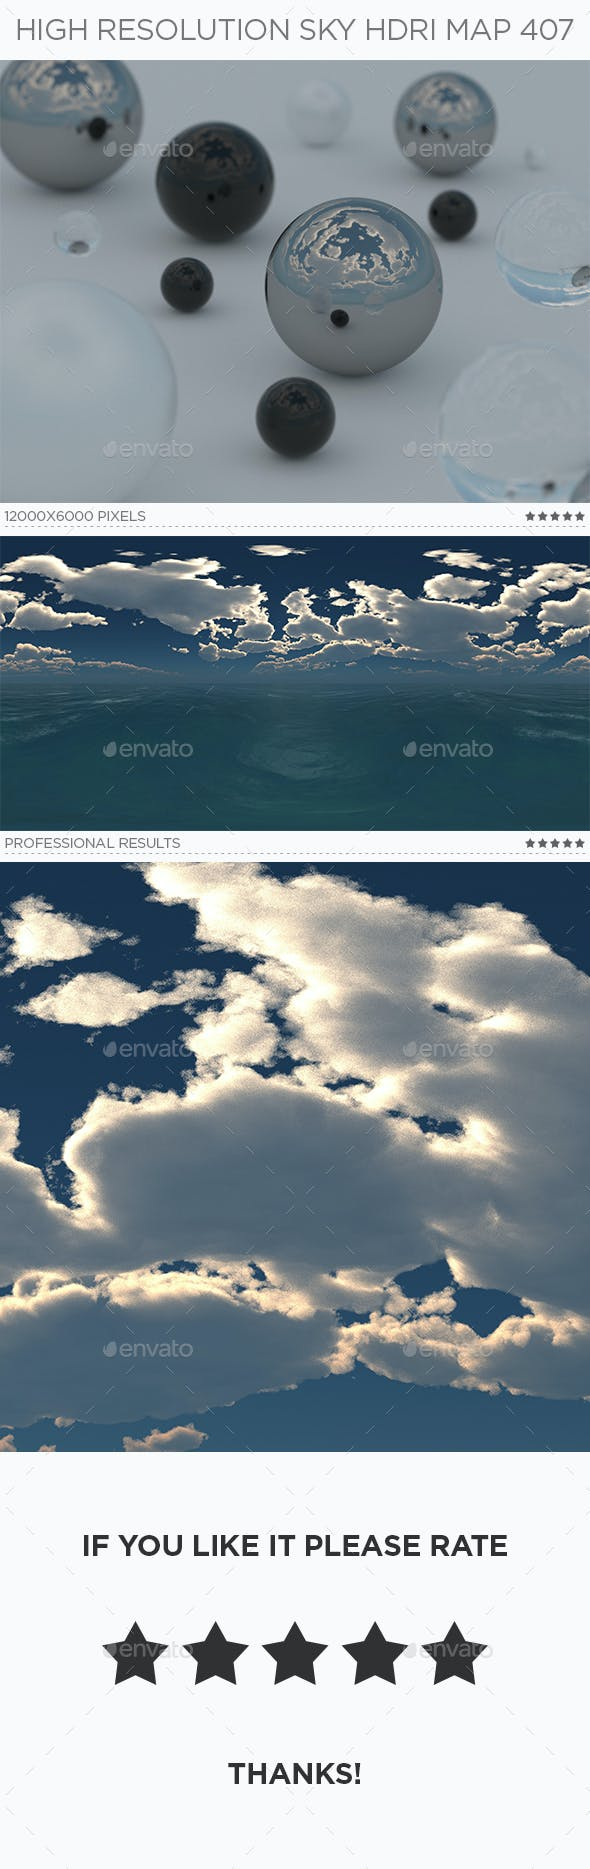 High Resolution Sky HDRi Map 407 - 3DOcean Item for Sale